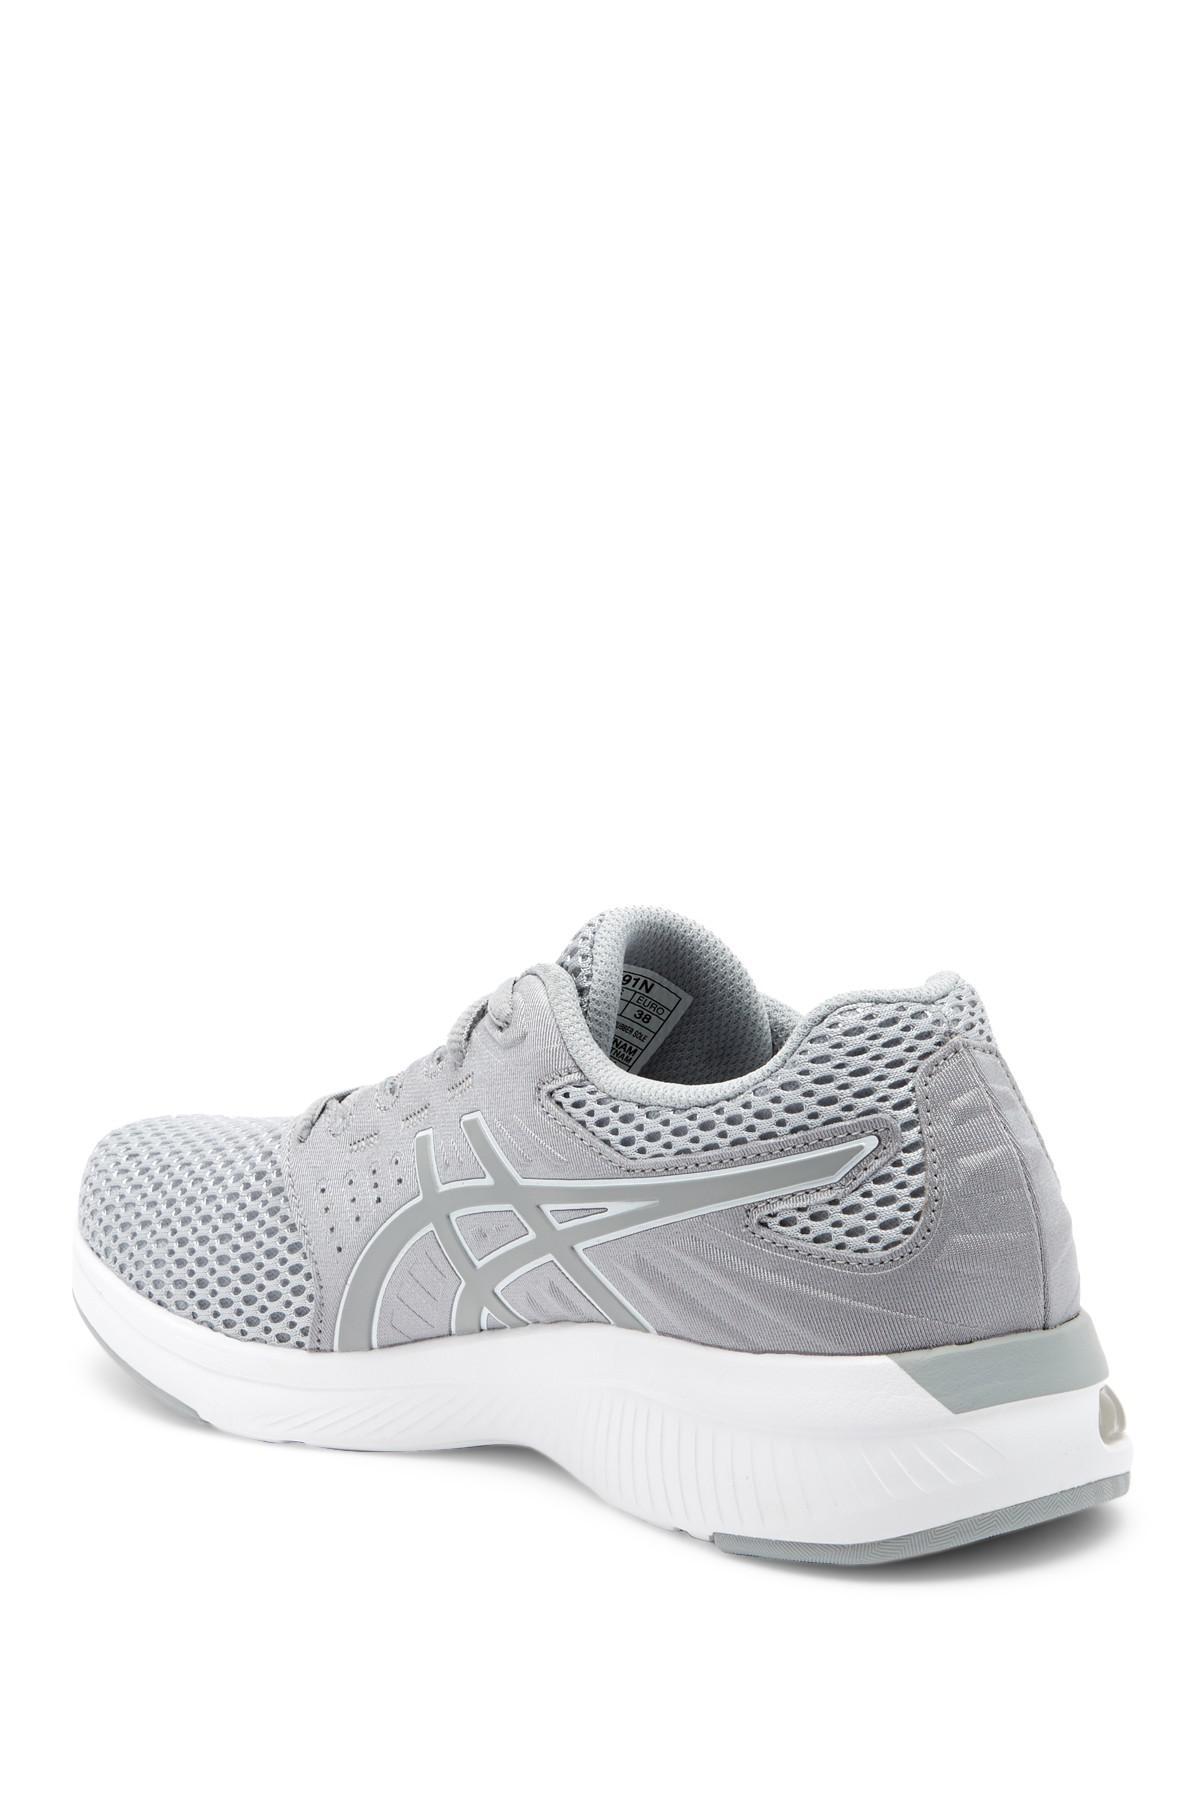 Asics Gel Moya Ladies Running Shoes VOBNNQU